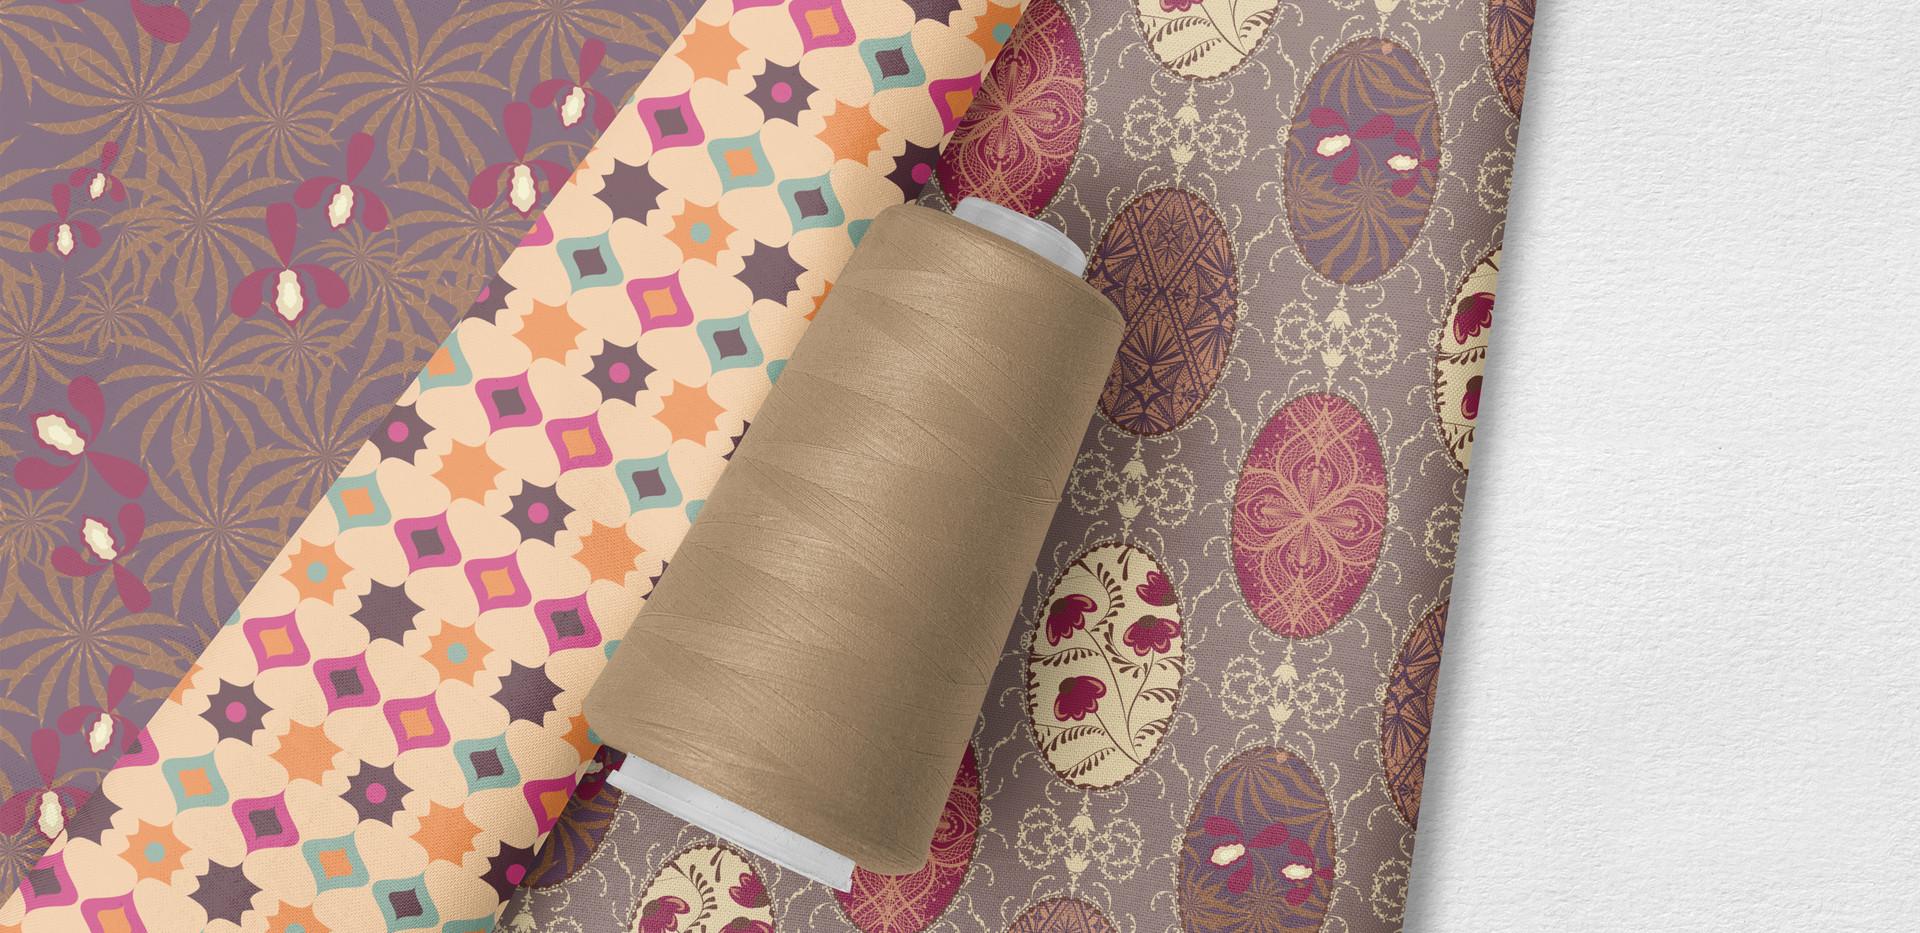 379-fabric-mockup-free.jpg